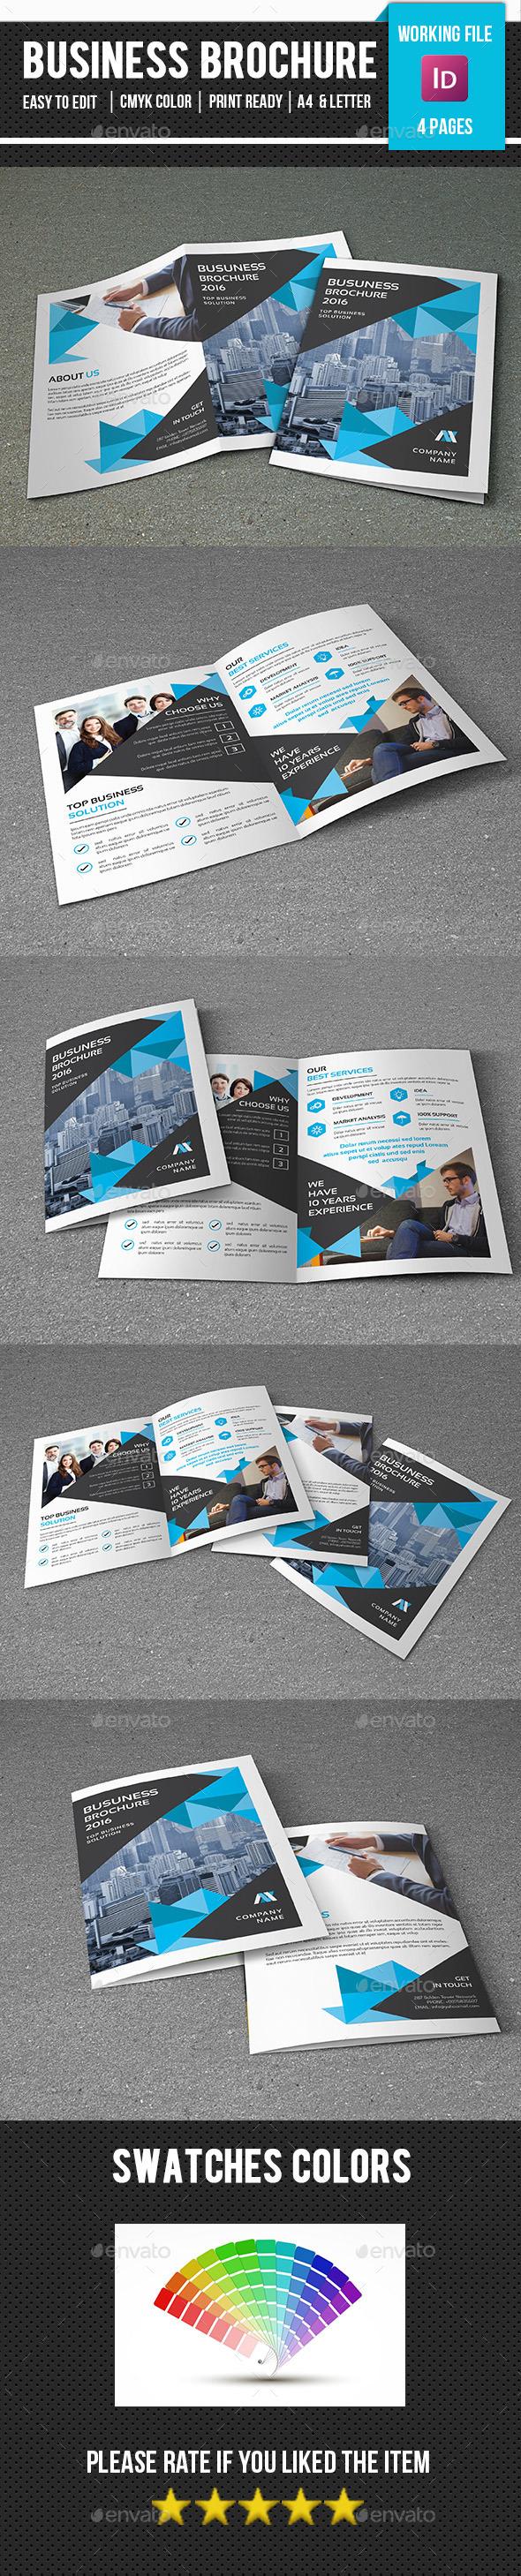 Business Bifold Brochure-V352 - Corporate Brochures